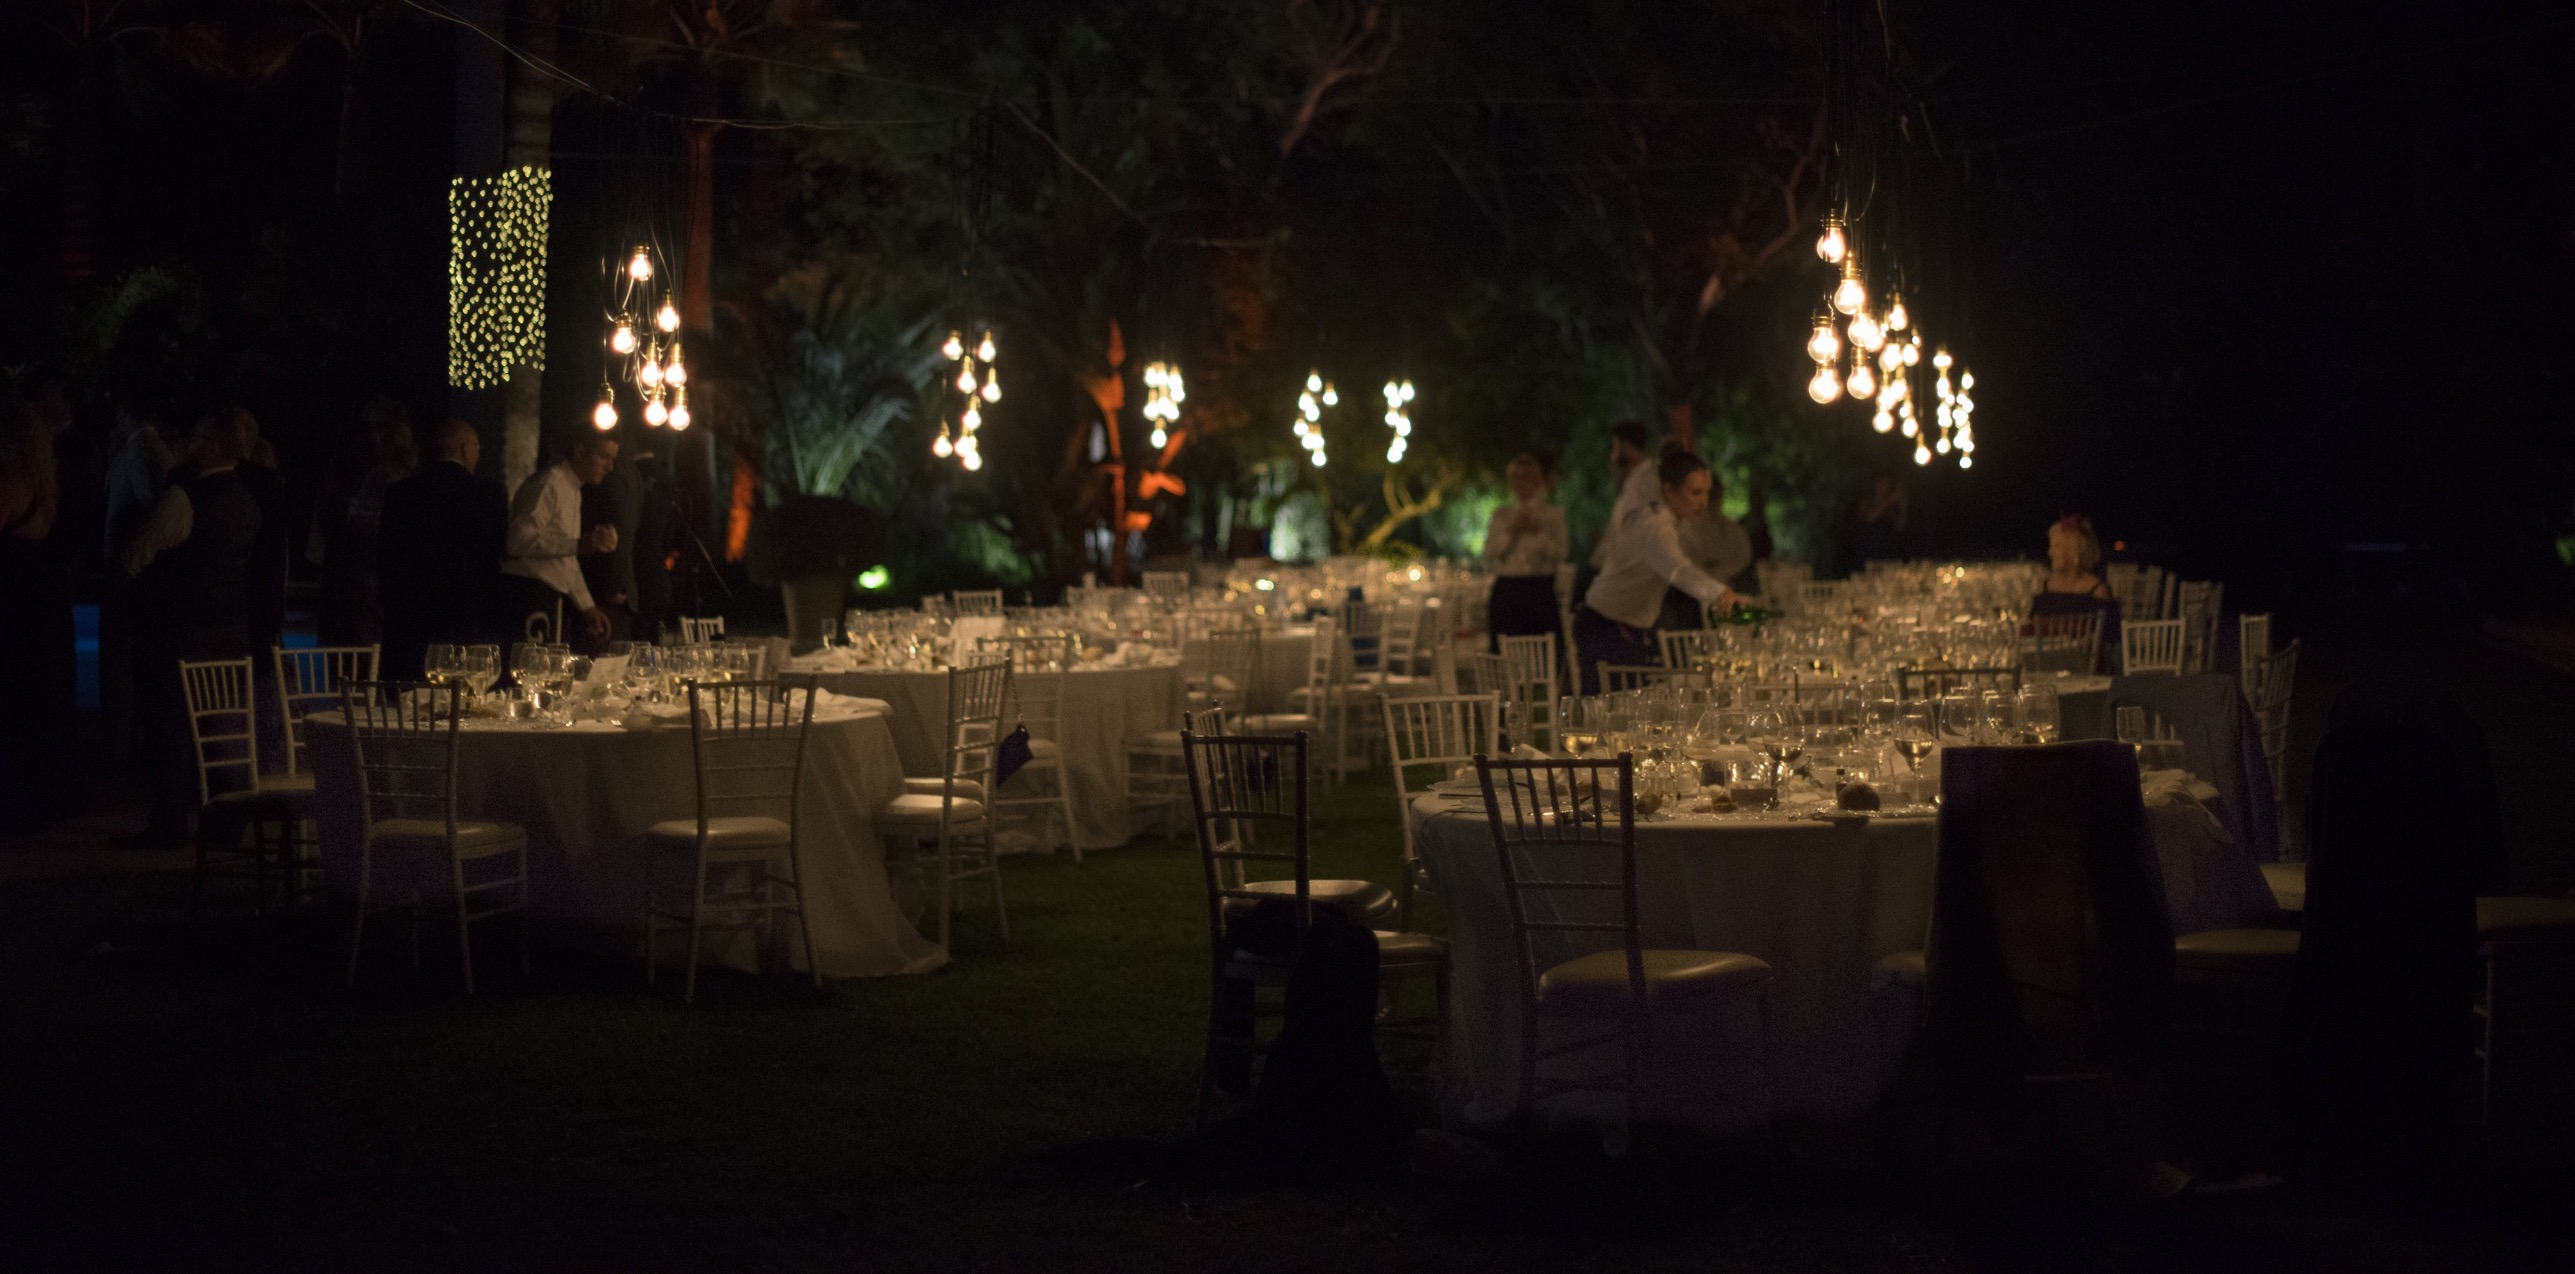 Si-Quiero-Wedding-Planner-By-Sira-Antequera-Bodas-Málaga-Marbella-Miami- Nicole-Guille-16